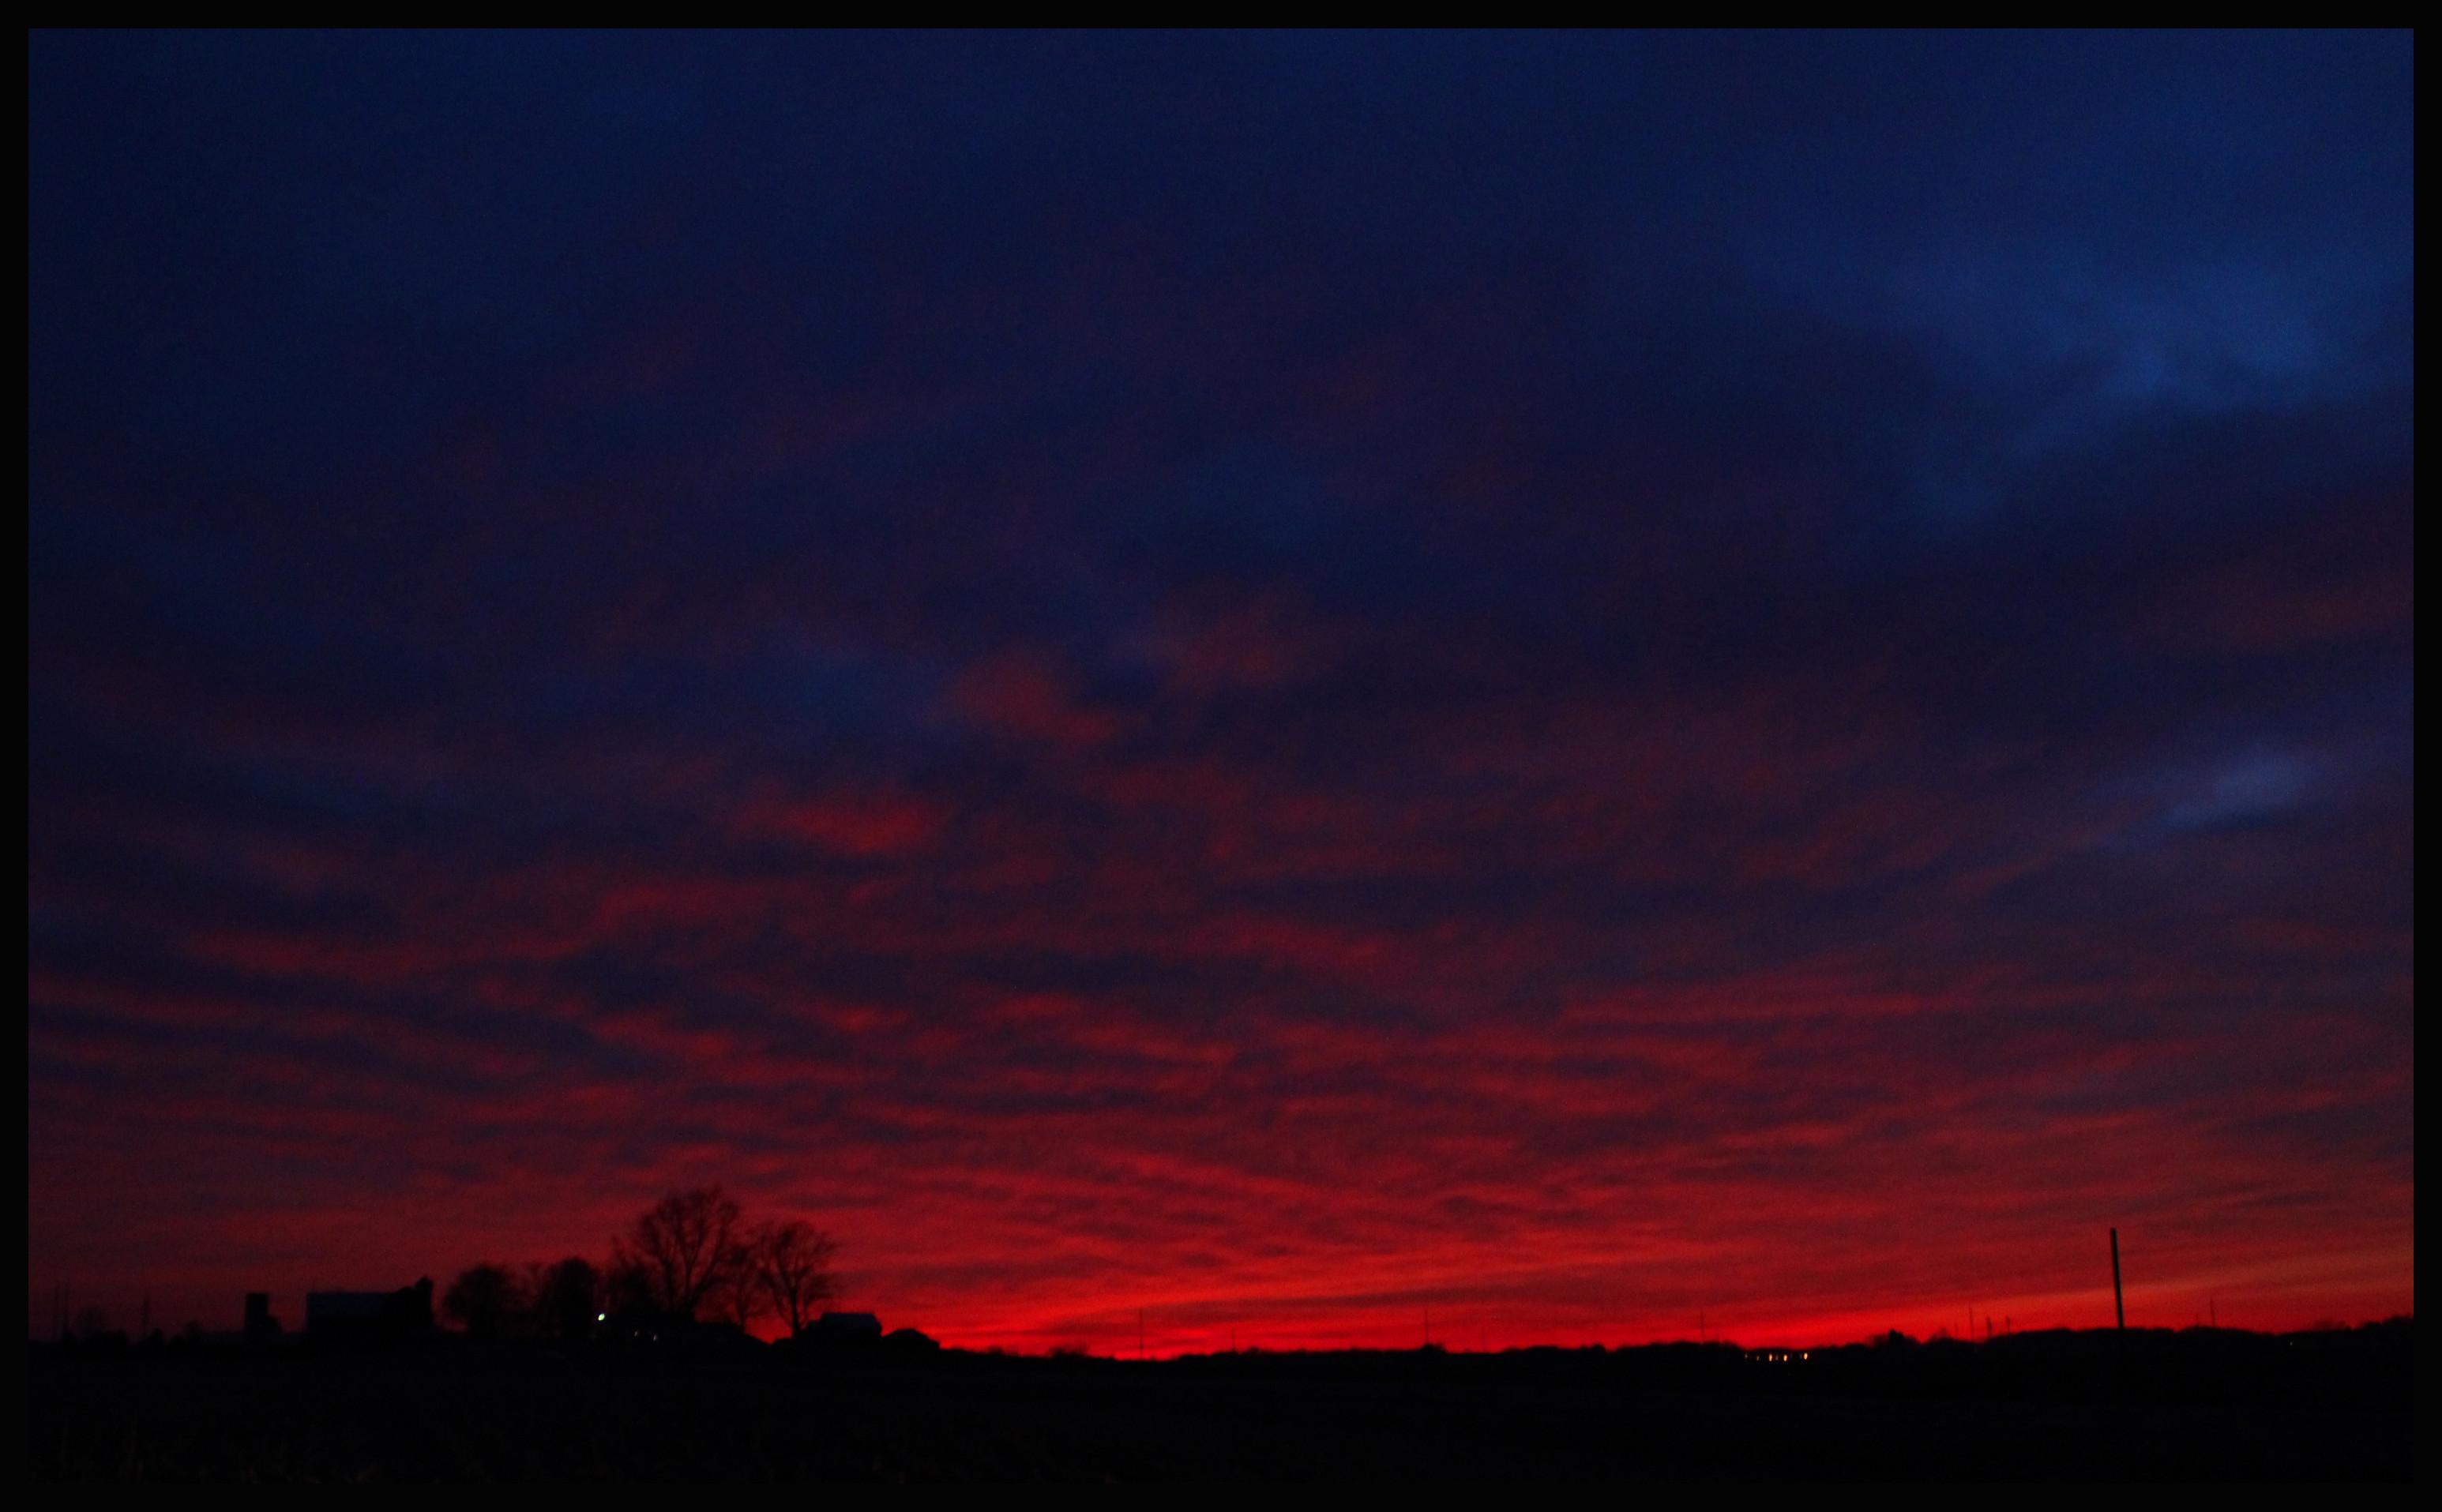 13 Beautiful Night Sky Wallpaper Collections – Yoanu.com